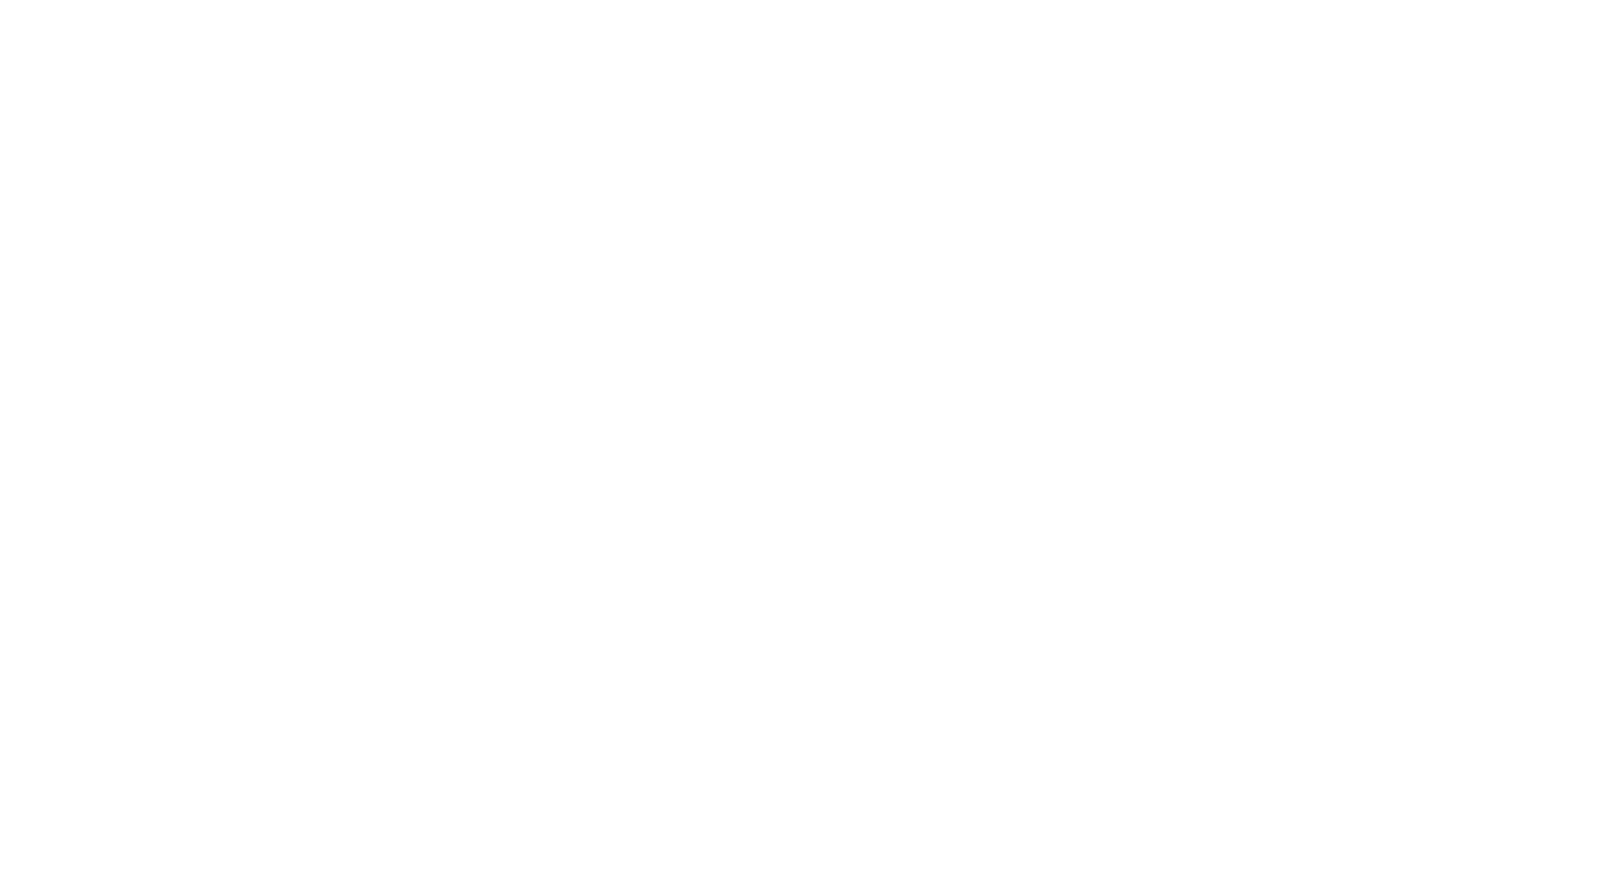 Komplett-Bett Ellmau mit großflächigem Fußteil